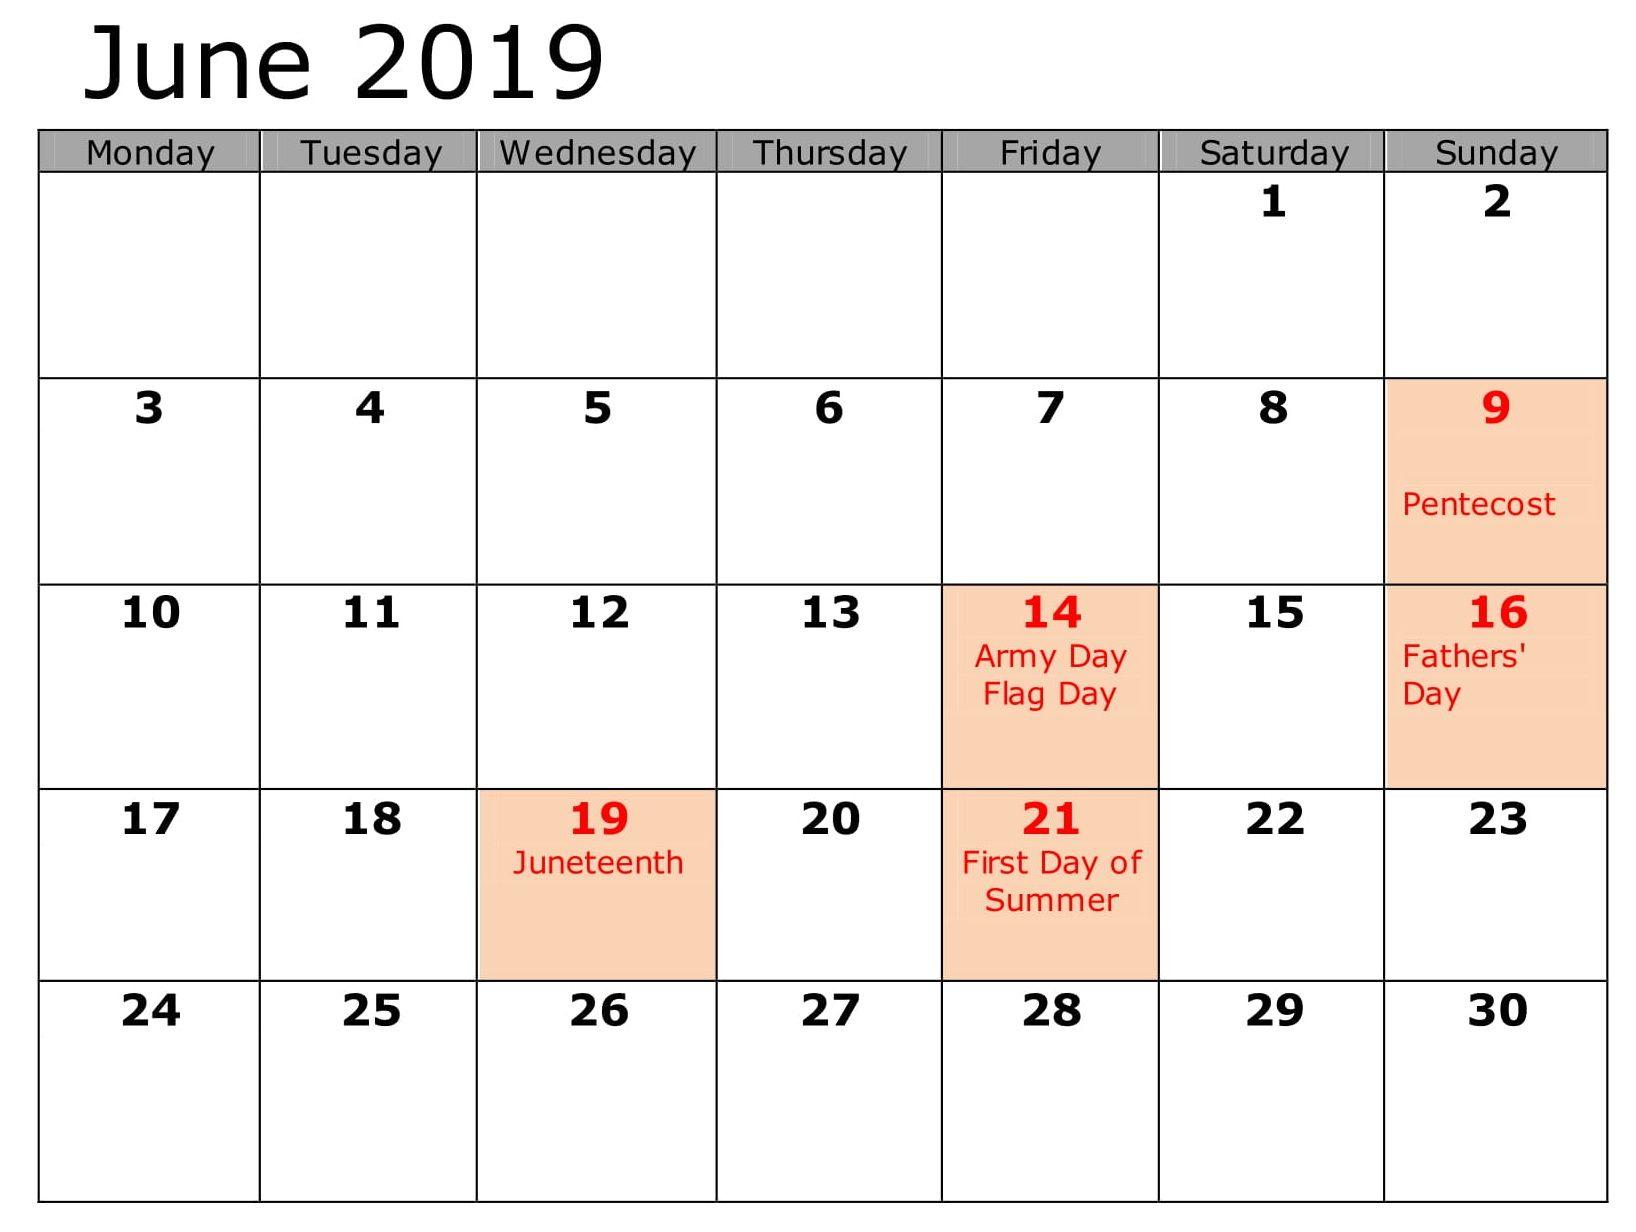 June 2019 Calendar With Holidays US, UK, Canada, Australia